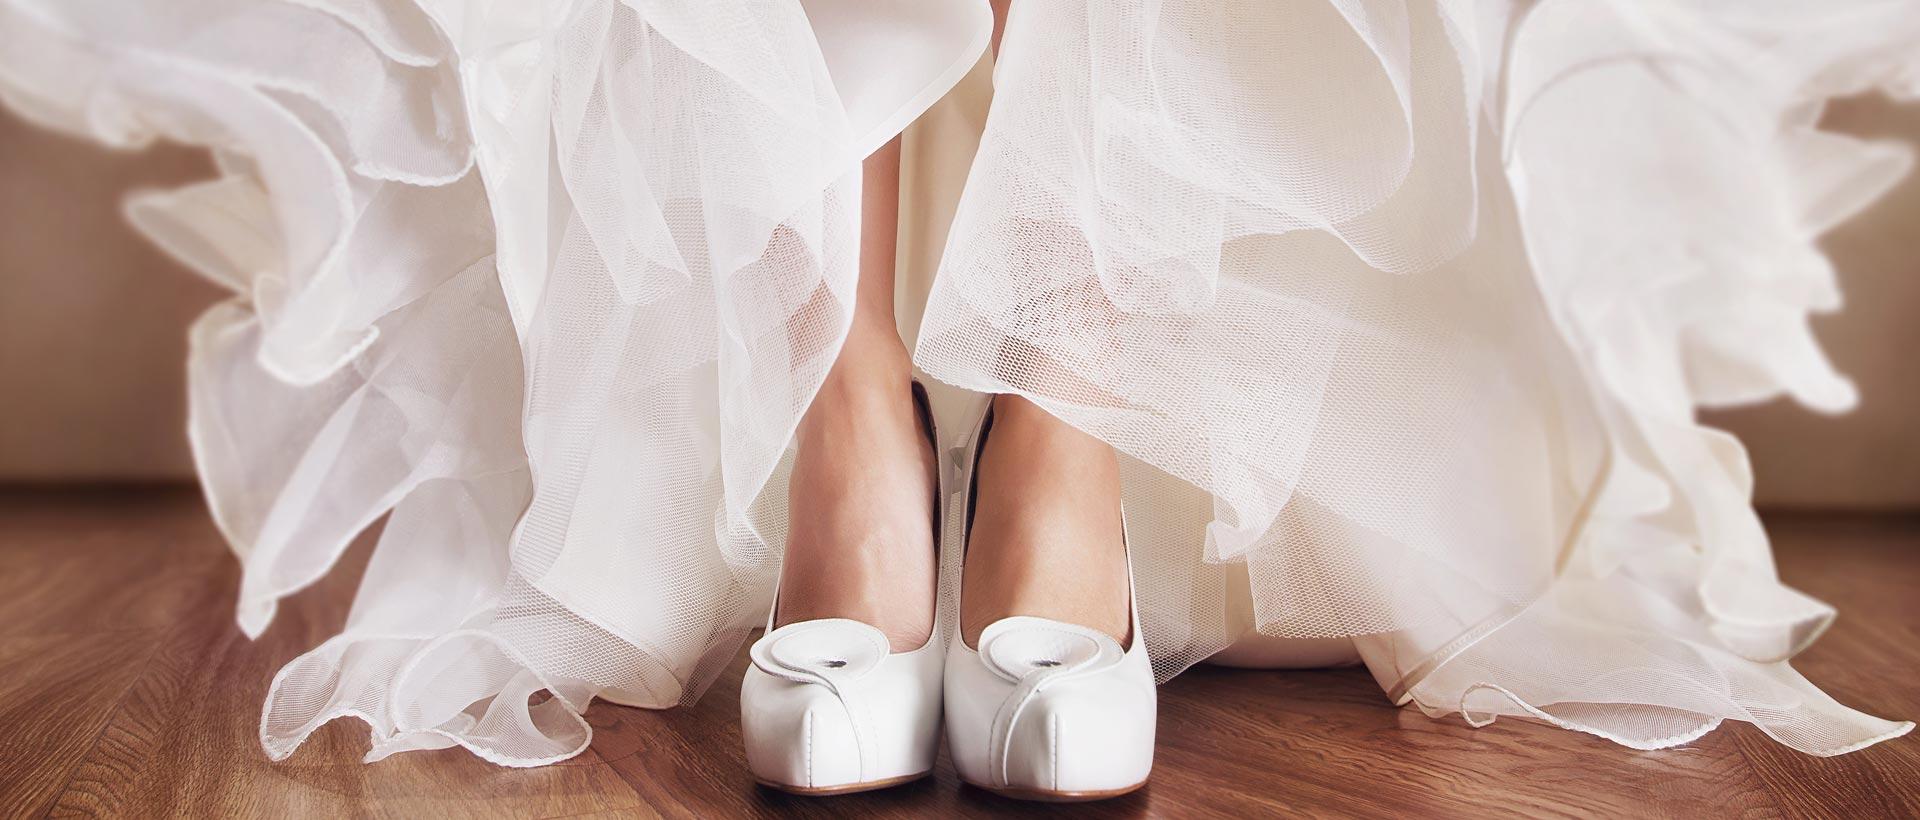 elegant bridal services